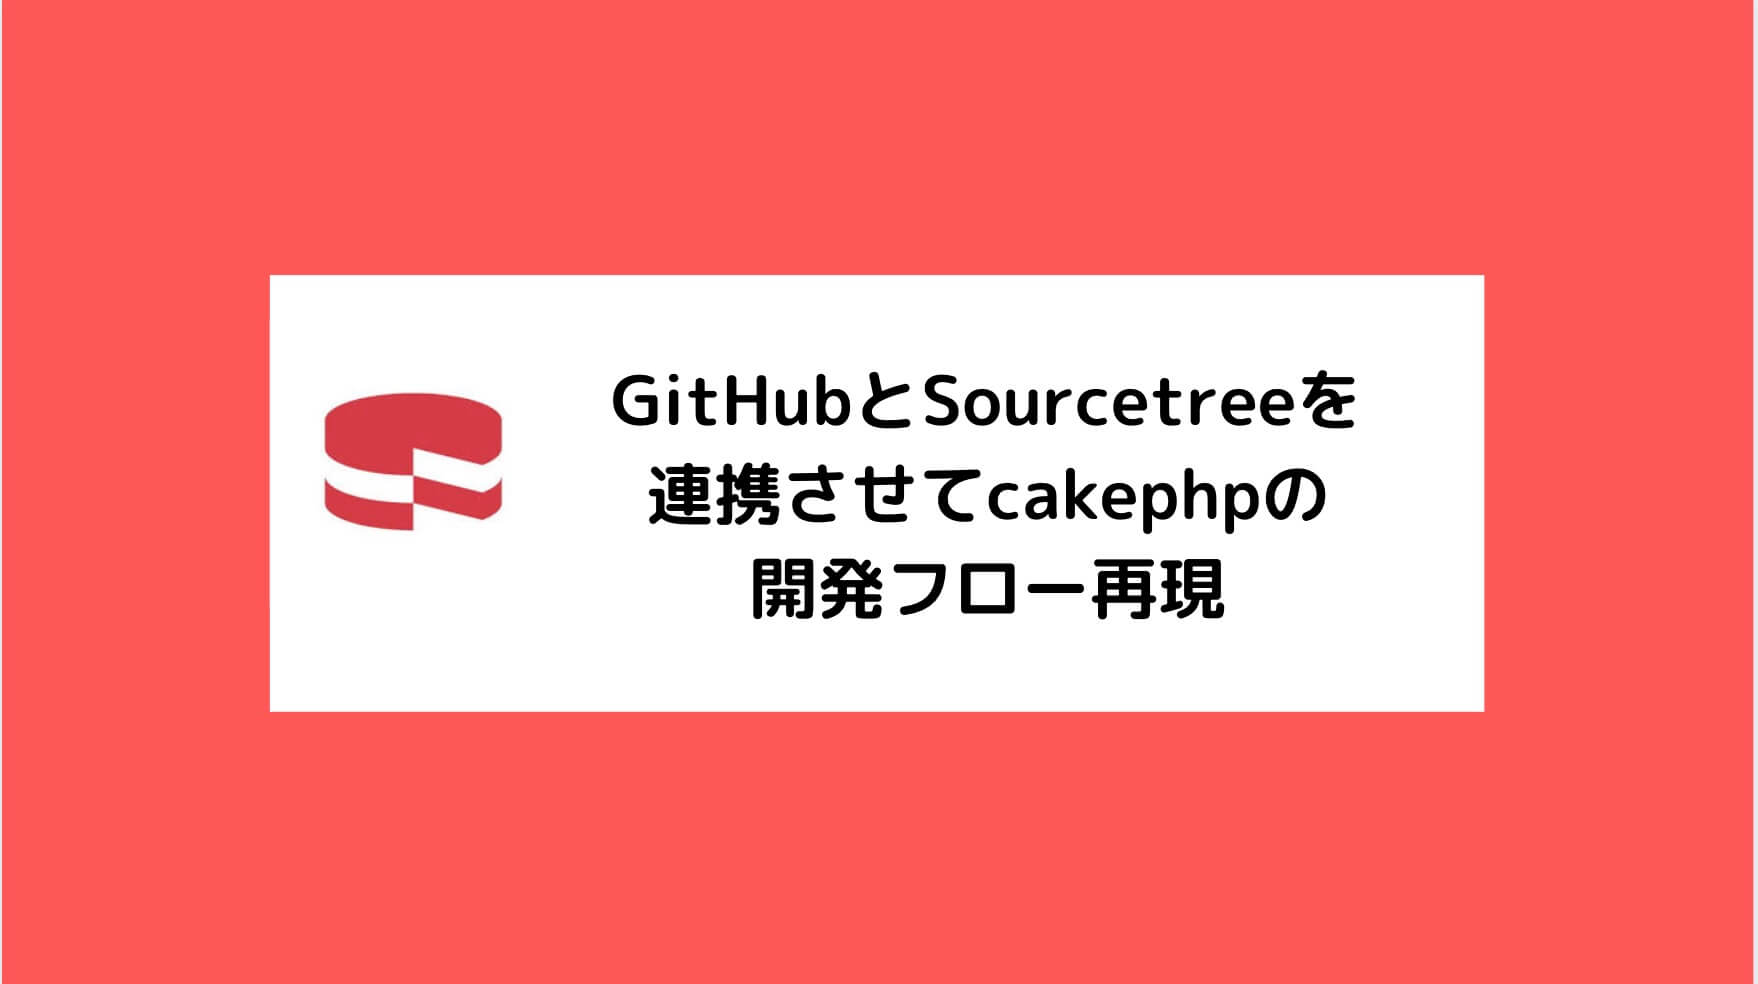 GitHubとSourcetreeを連携させてcakephpの開発フロー再現と書かれた画像